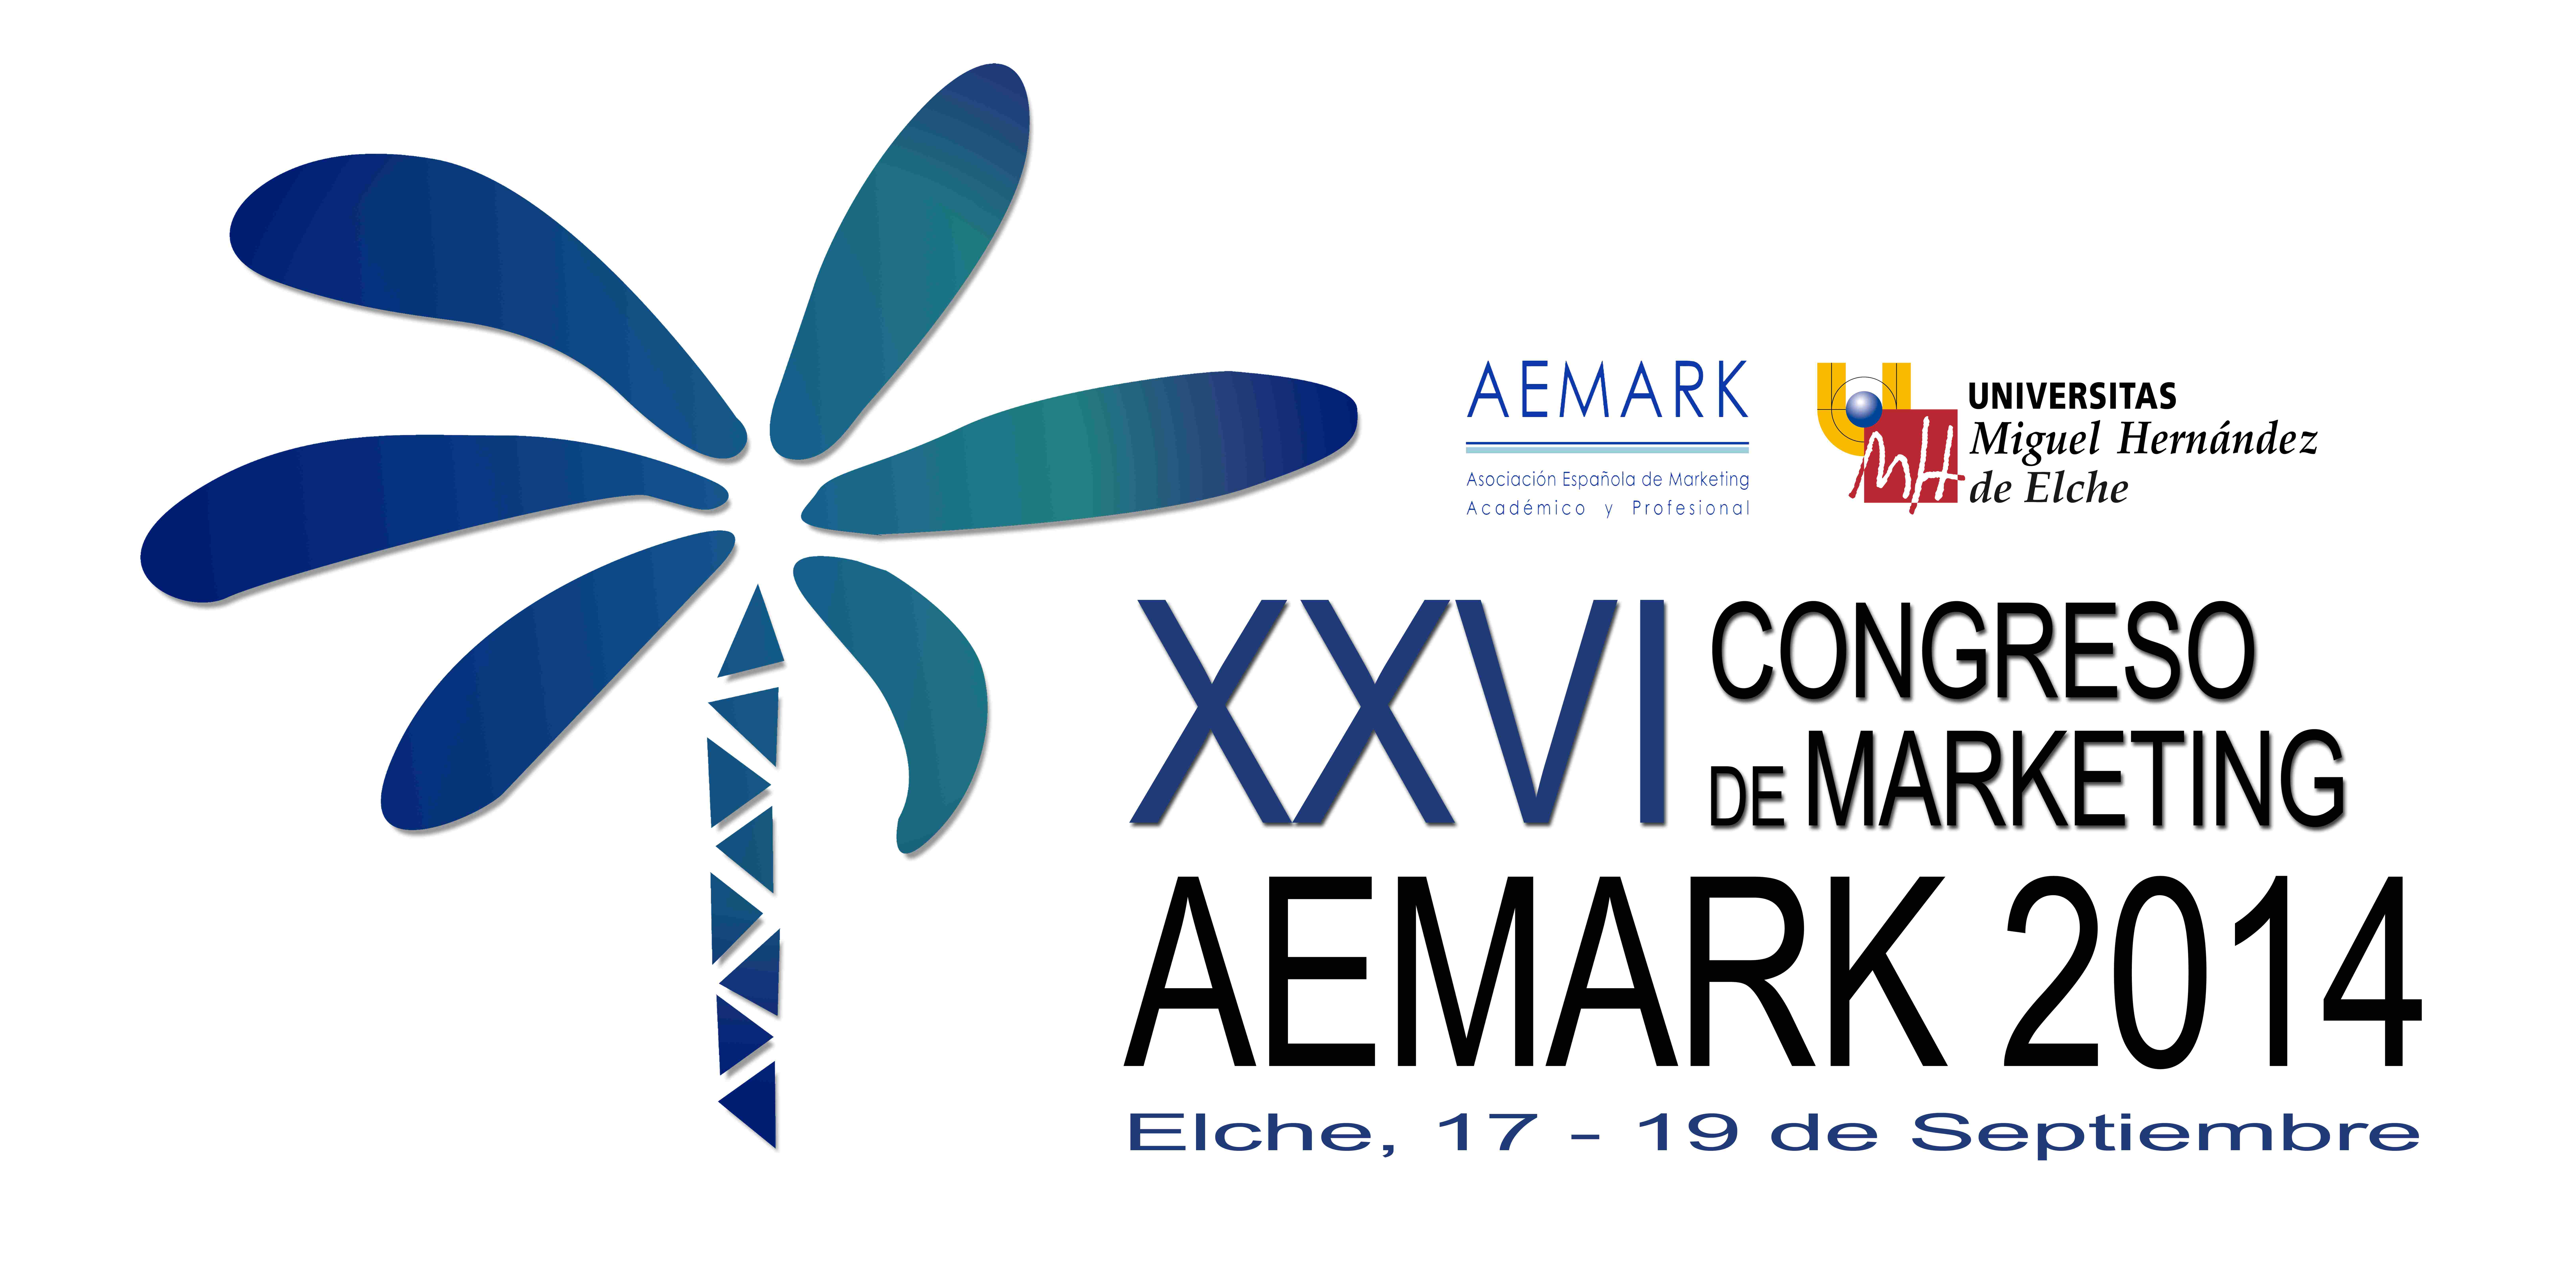 http://comunicacion.umh.es/files/2014/04/04-04-14-Logo-m%C3%A1rketing-AEMARK-2014-Fondo-blanco-2.jpg